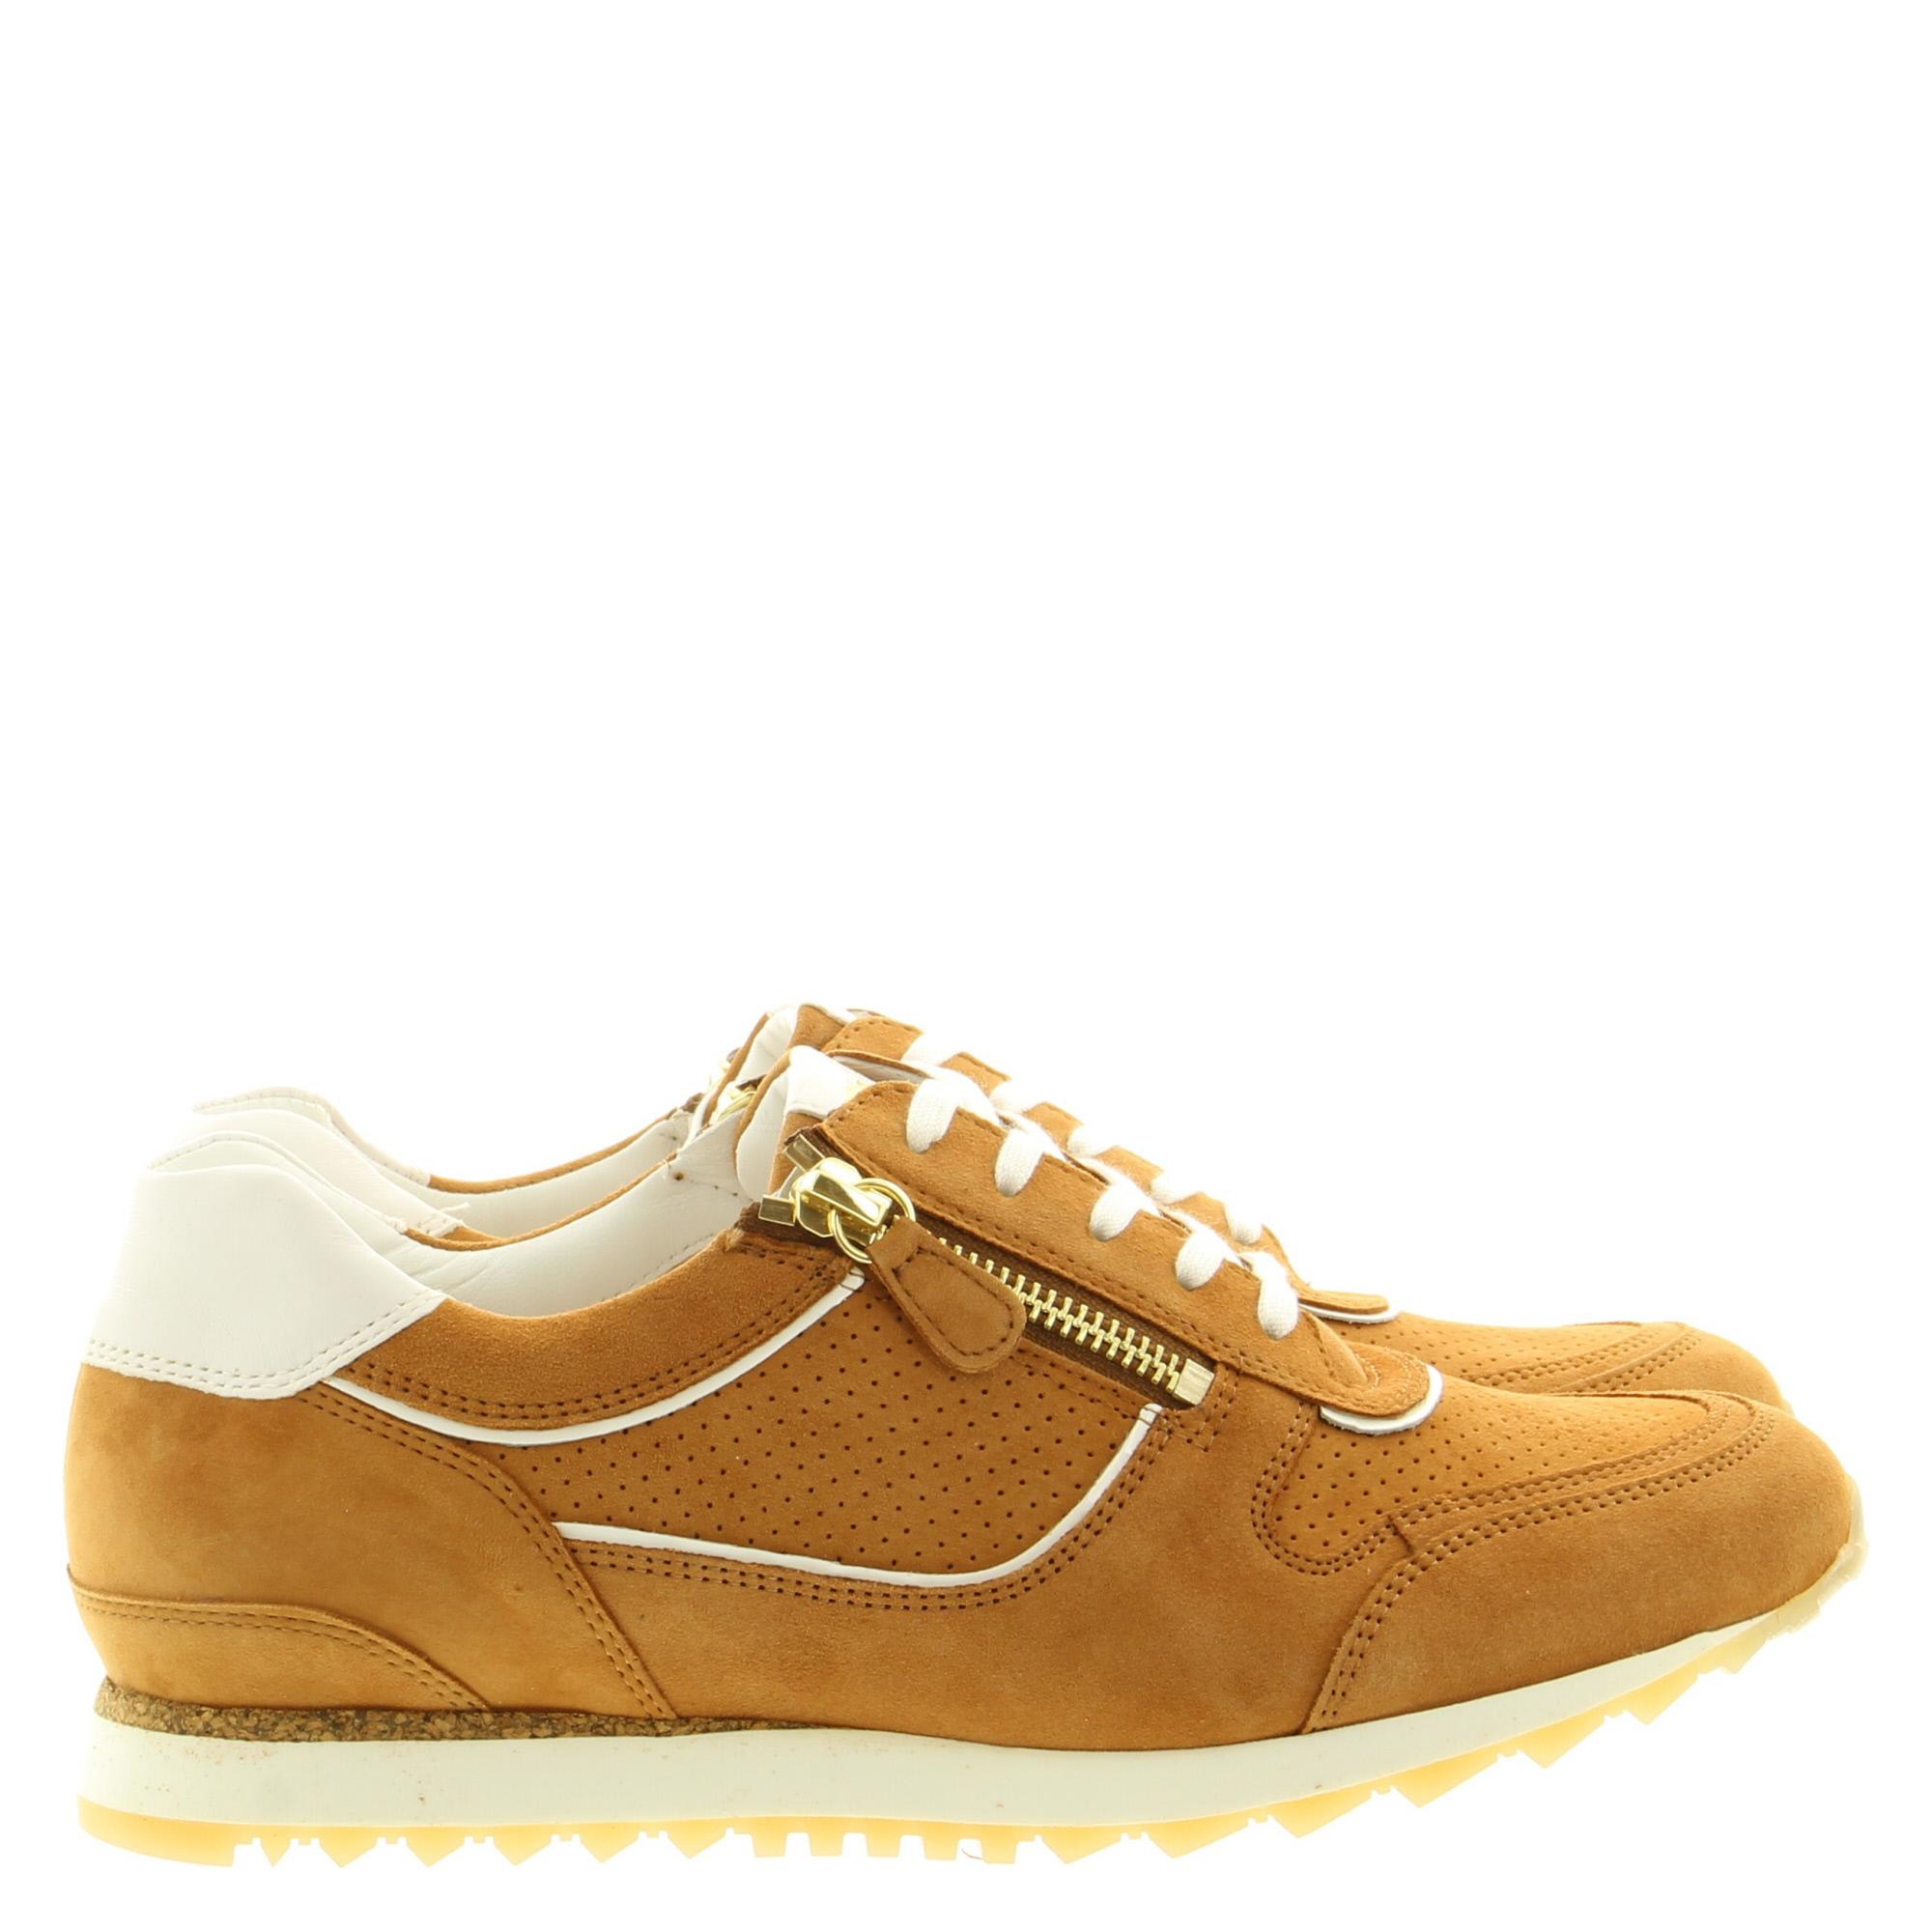 Hassia Shoes 301919 Barcelona 2906 Hazel Milk